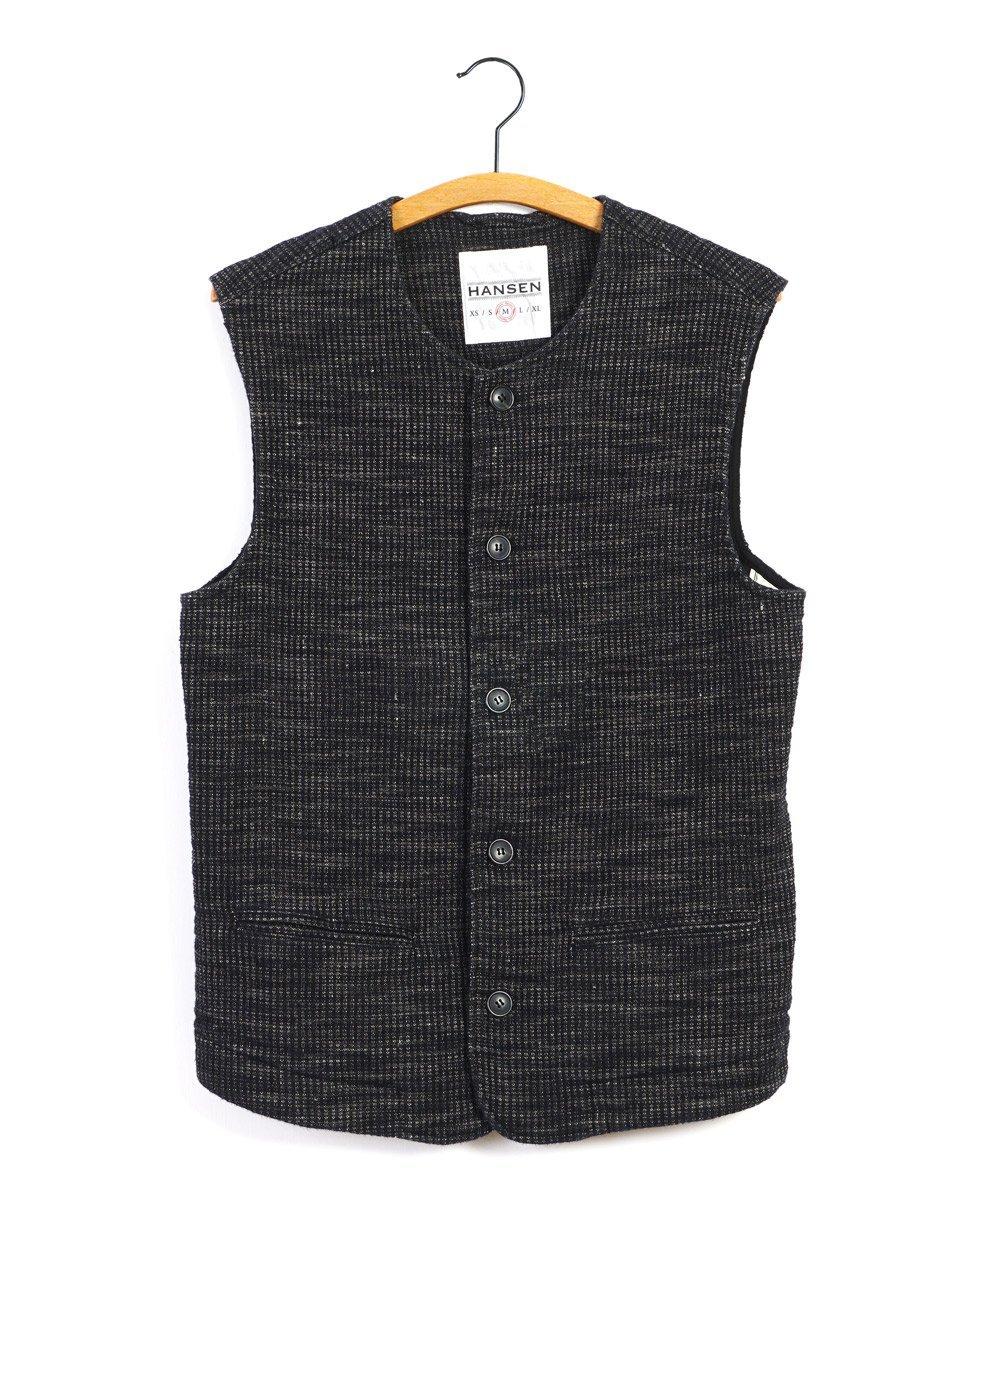 Hansen Garments BEN   Crew Neck Waistcoat   Black Hemp